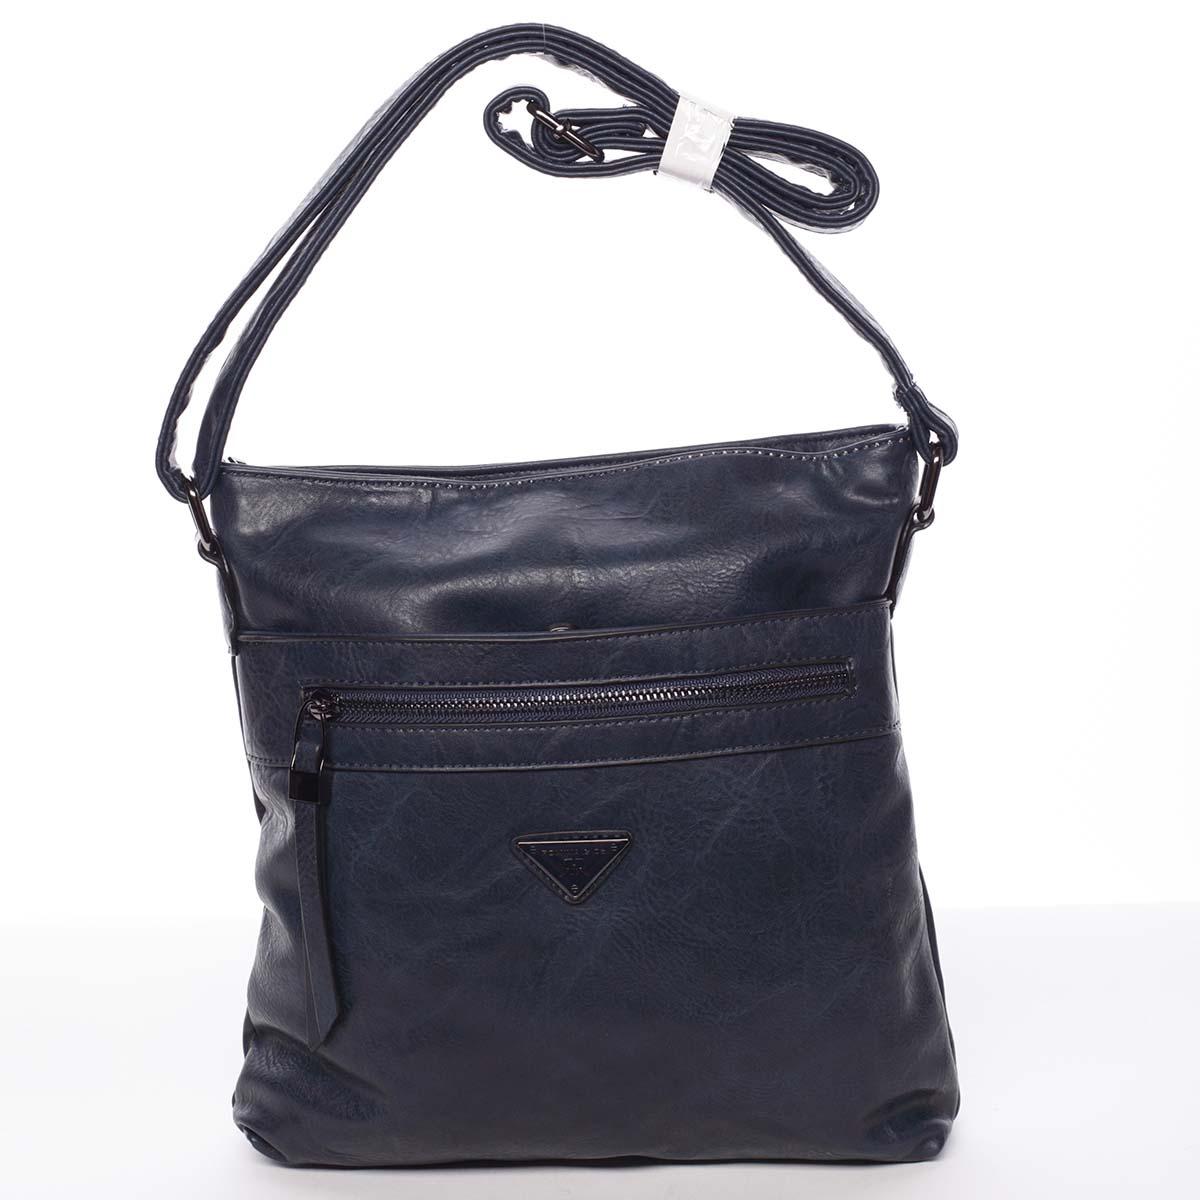 Trendy měkká crossbody kabelka modrá - Delami Devyn modrá